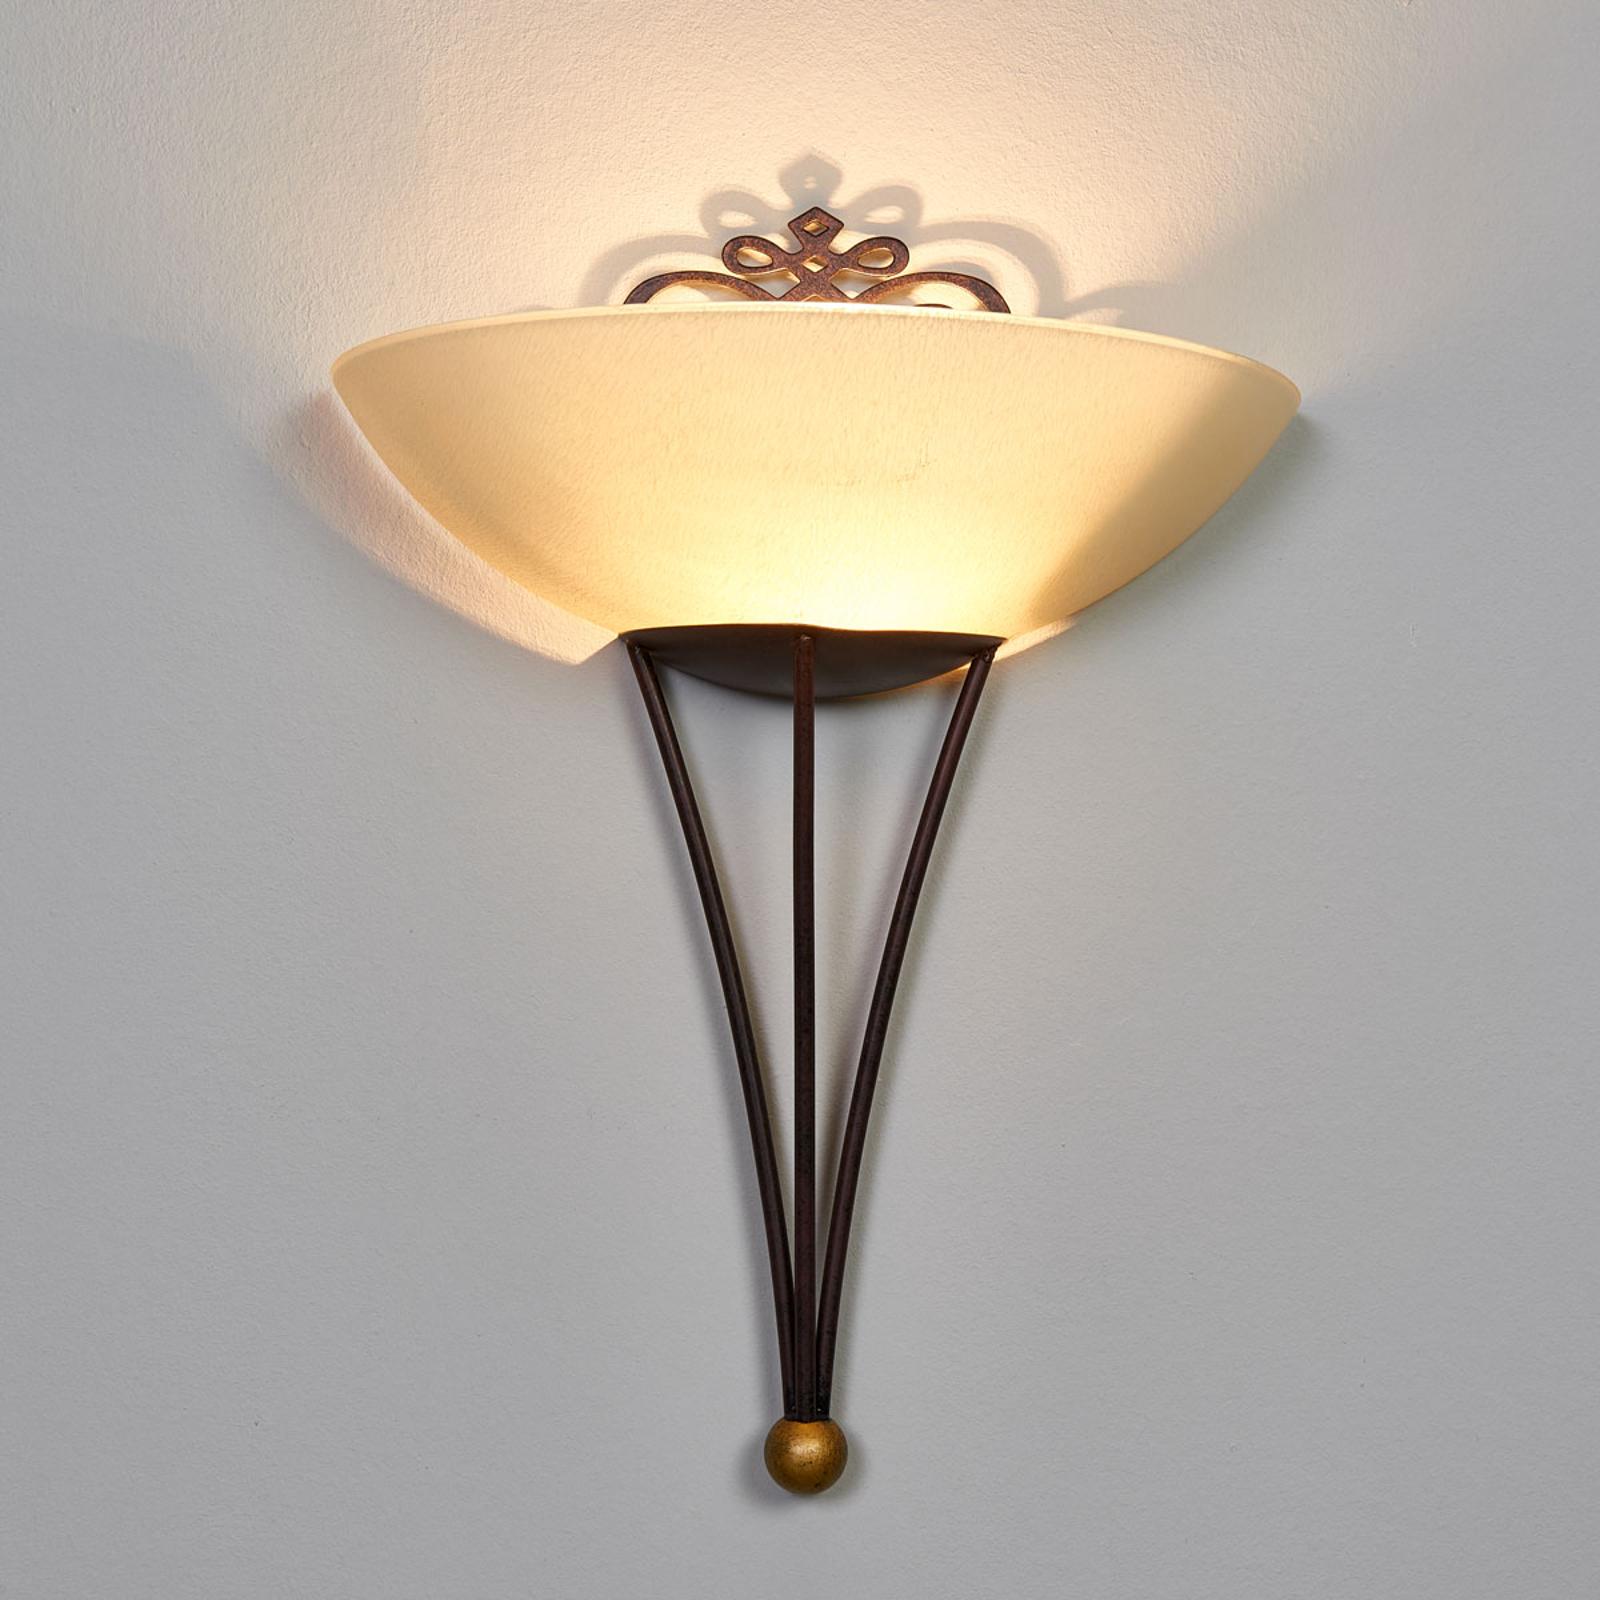 Smaakvolle wandlamp Master met versiering